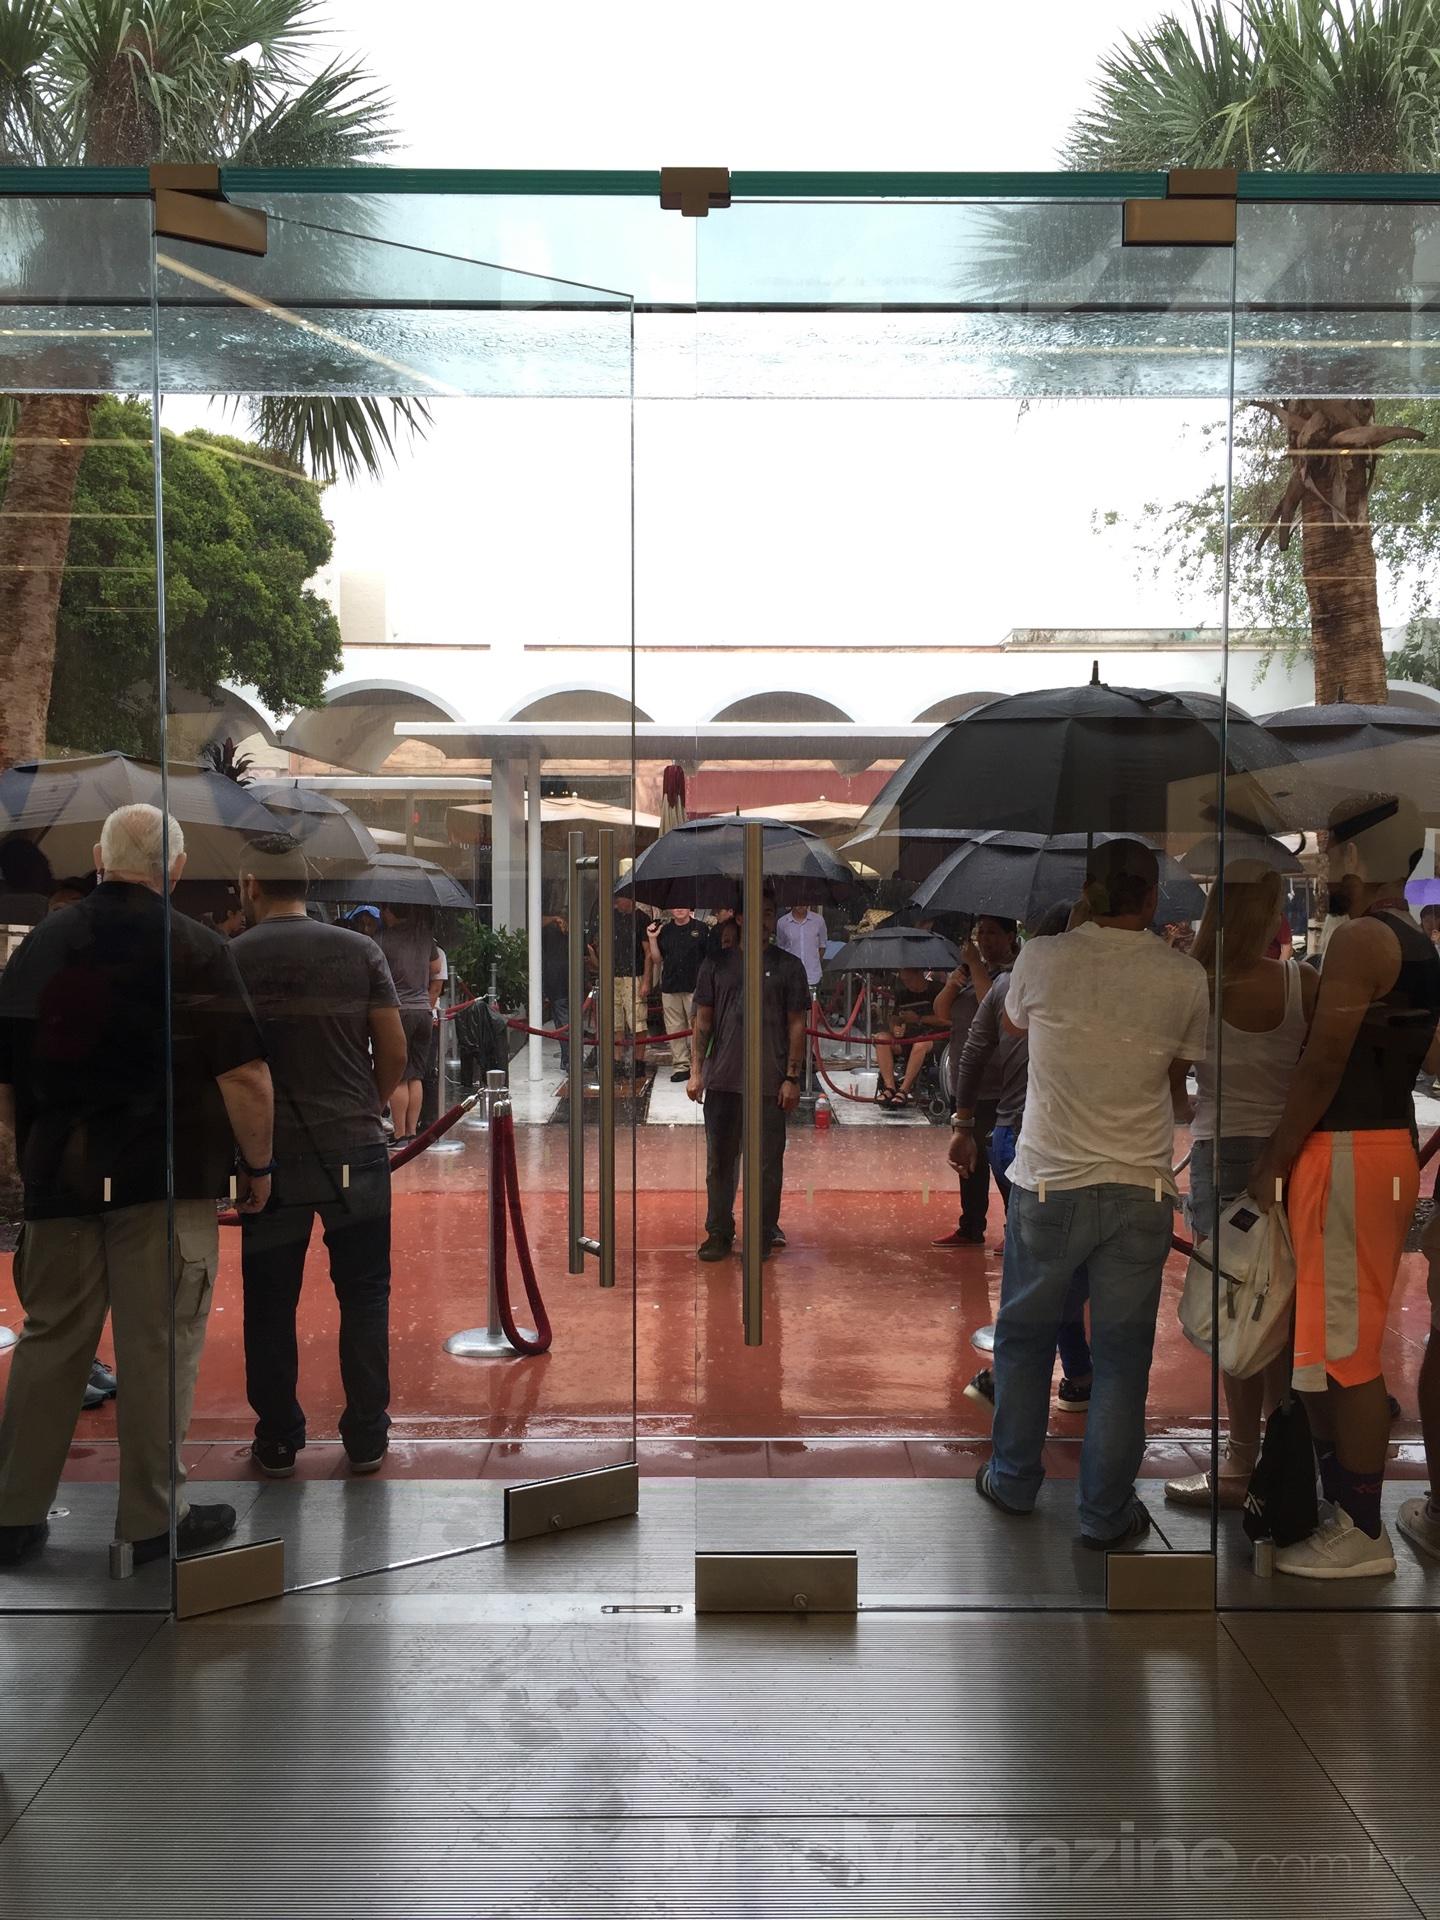 Abertura da loja - Comprando o iPhone 6s